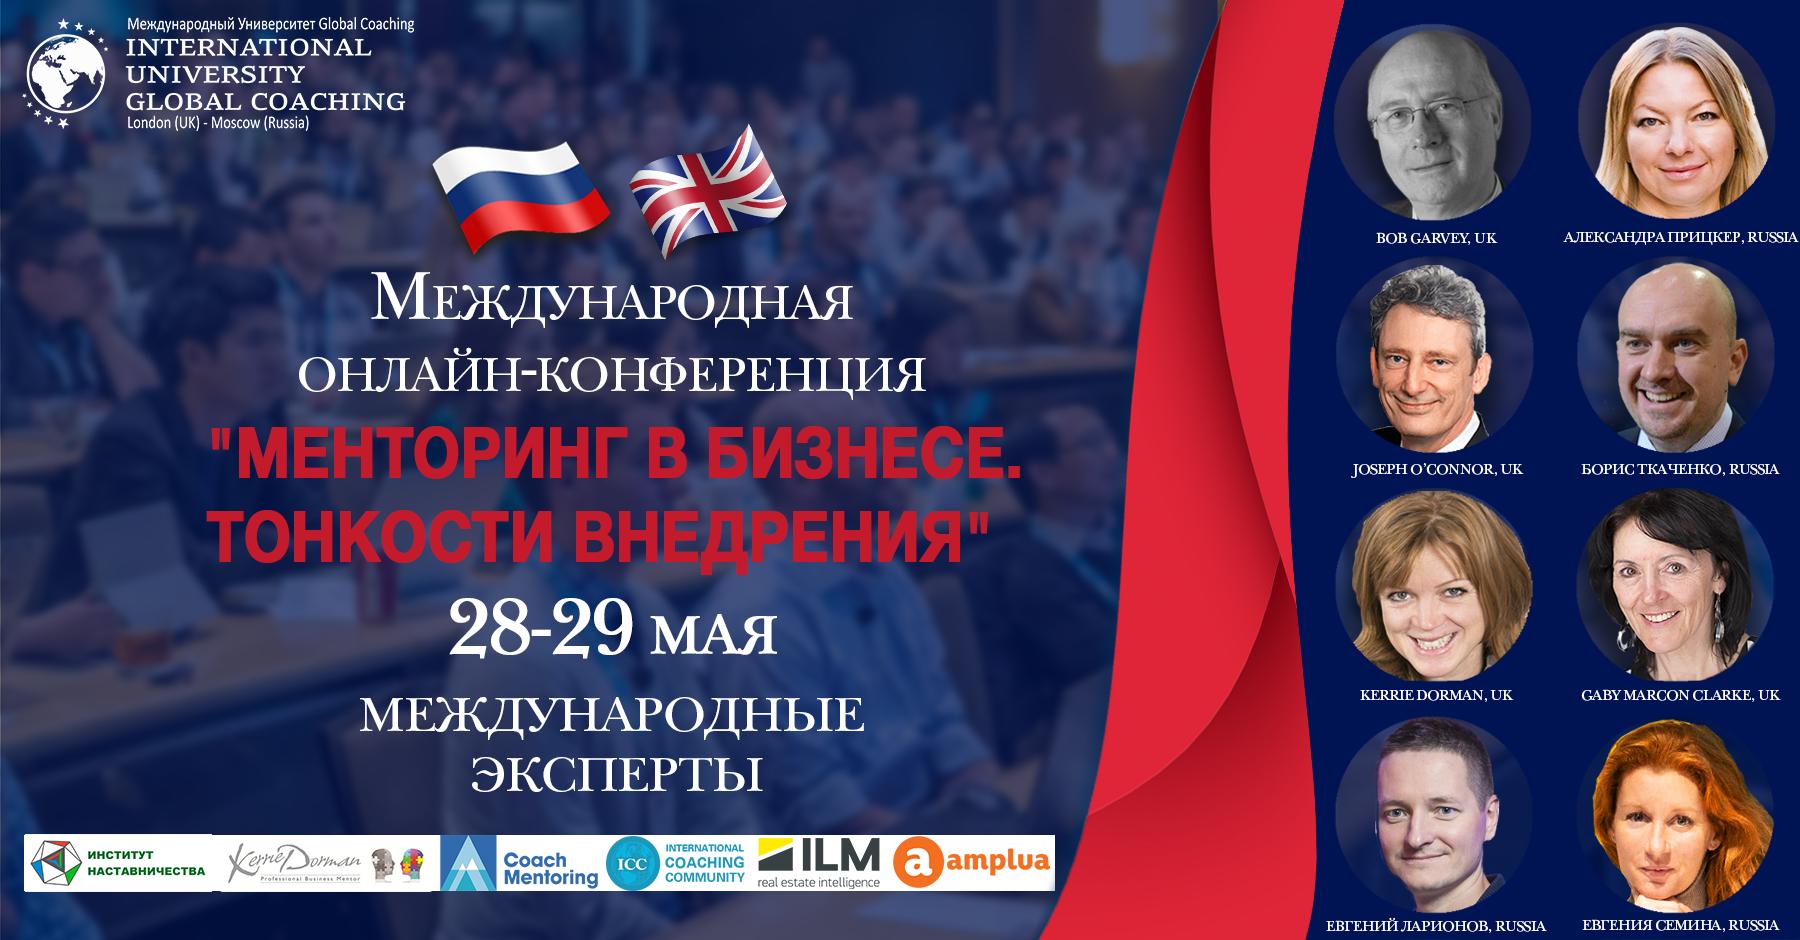 Международная онлайн-конференция 1